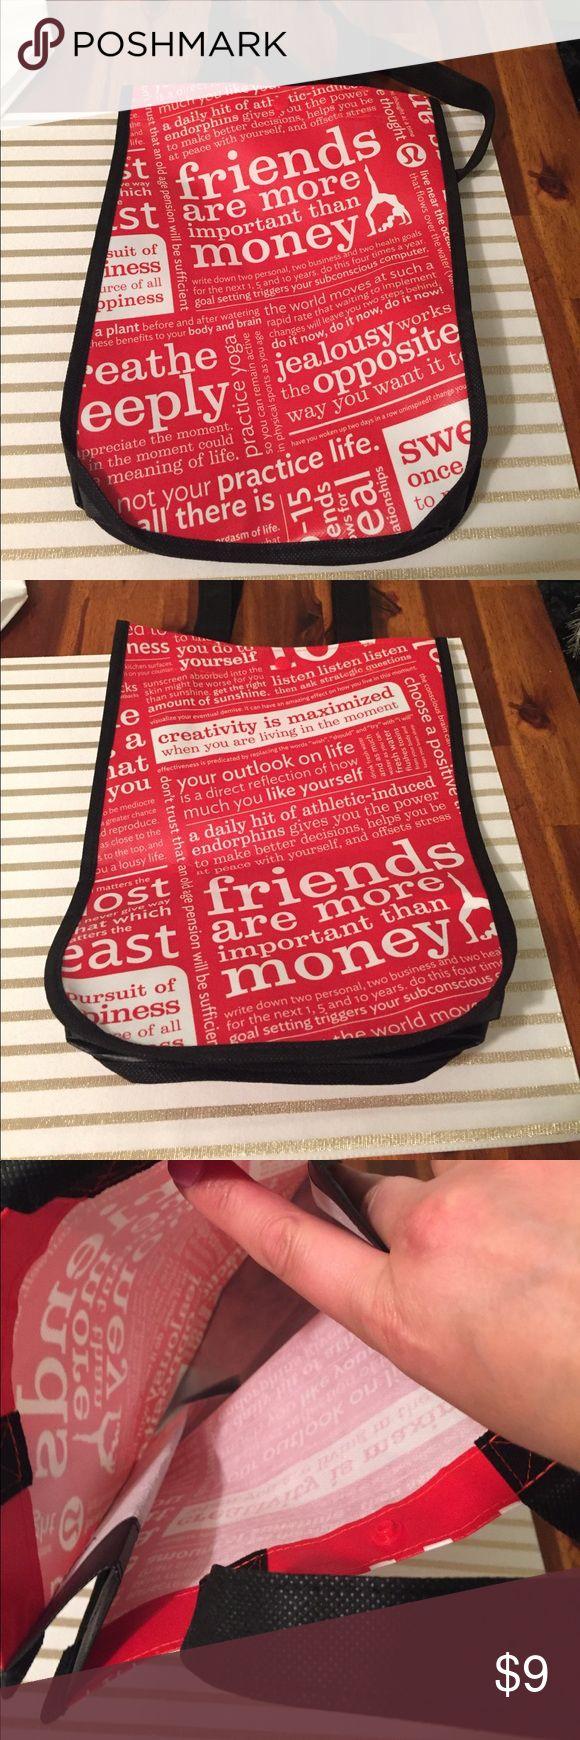 Small size lululemon bag / shopper Lululemon Bag lululemon athletica Bags Totes